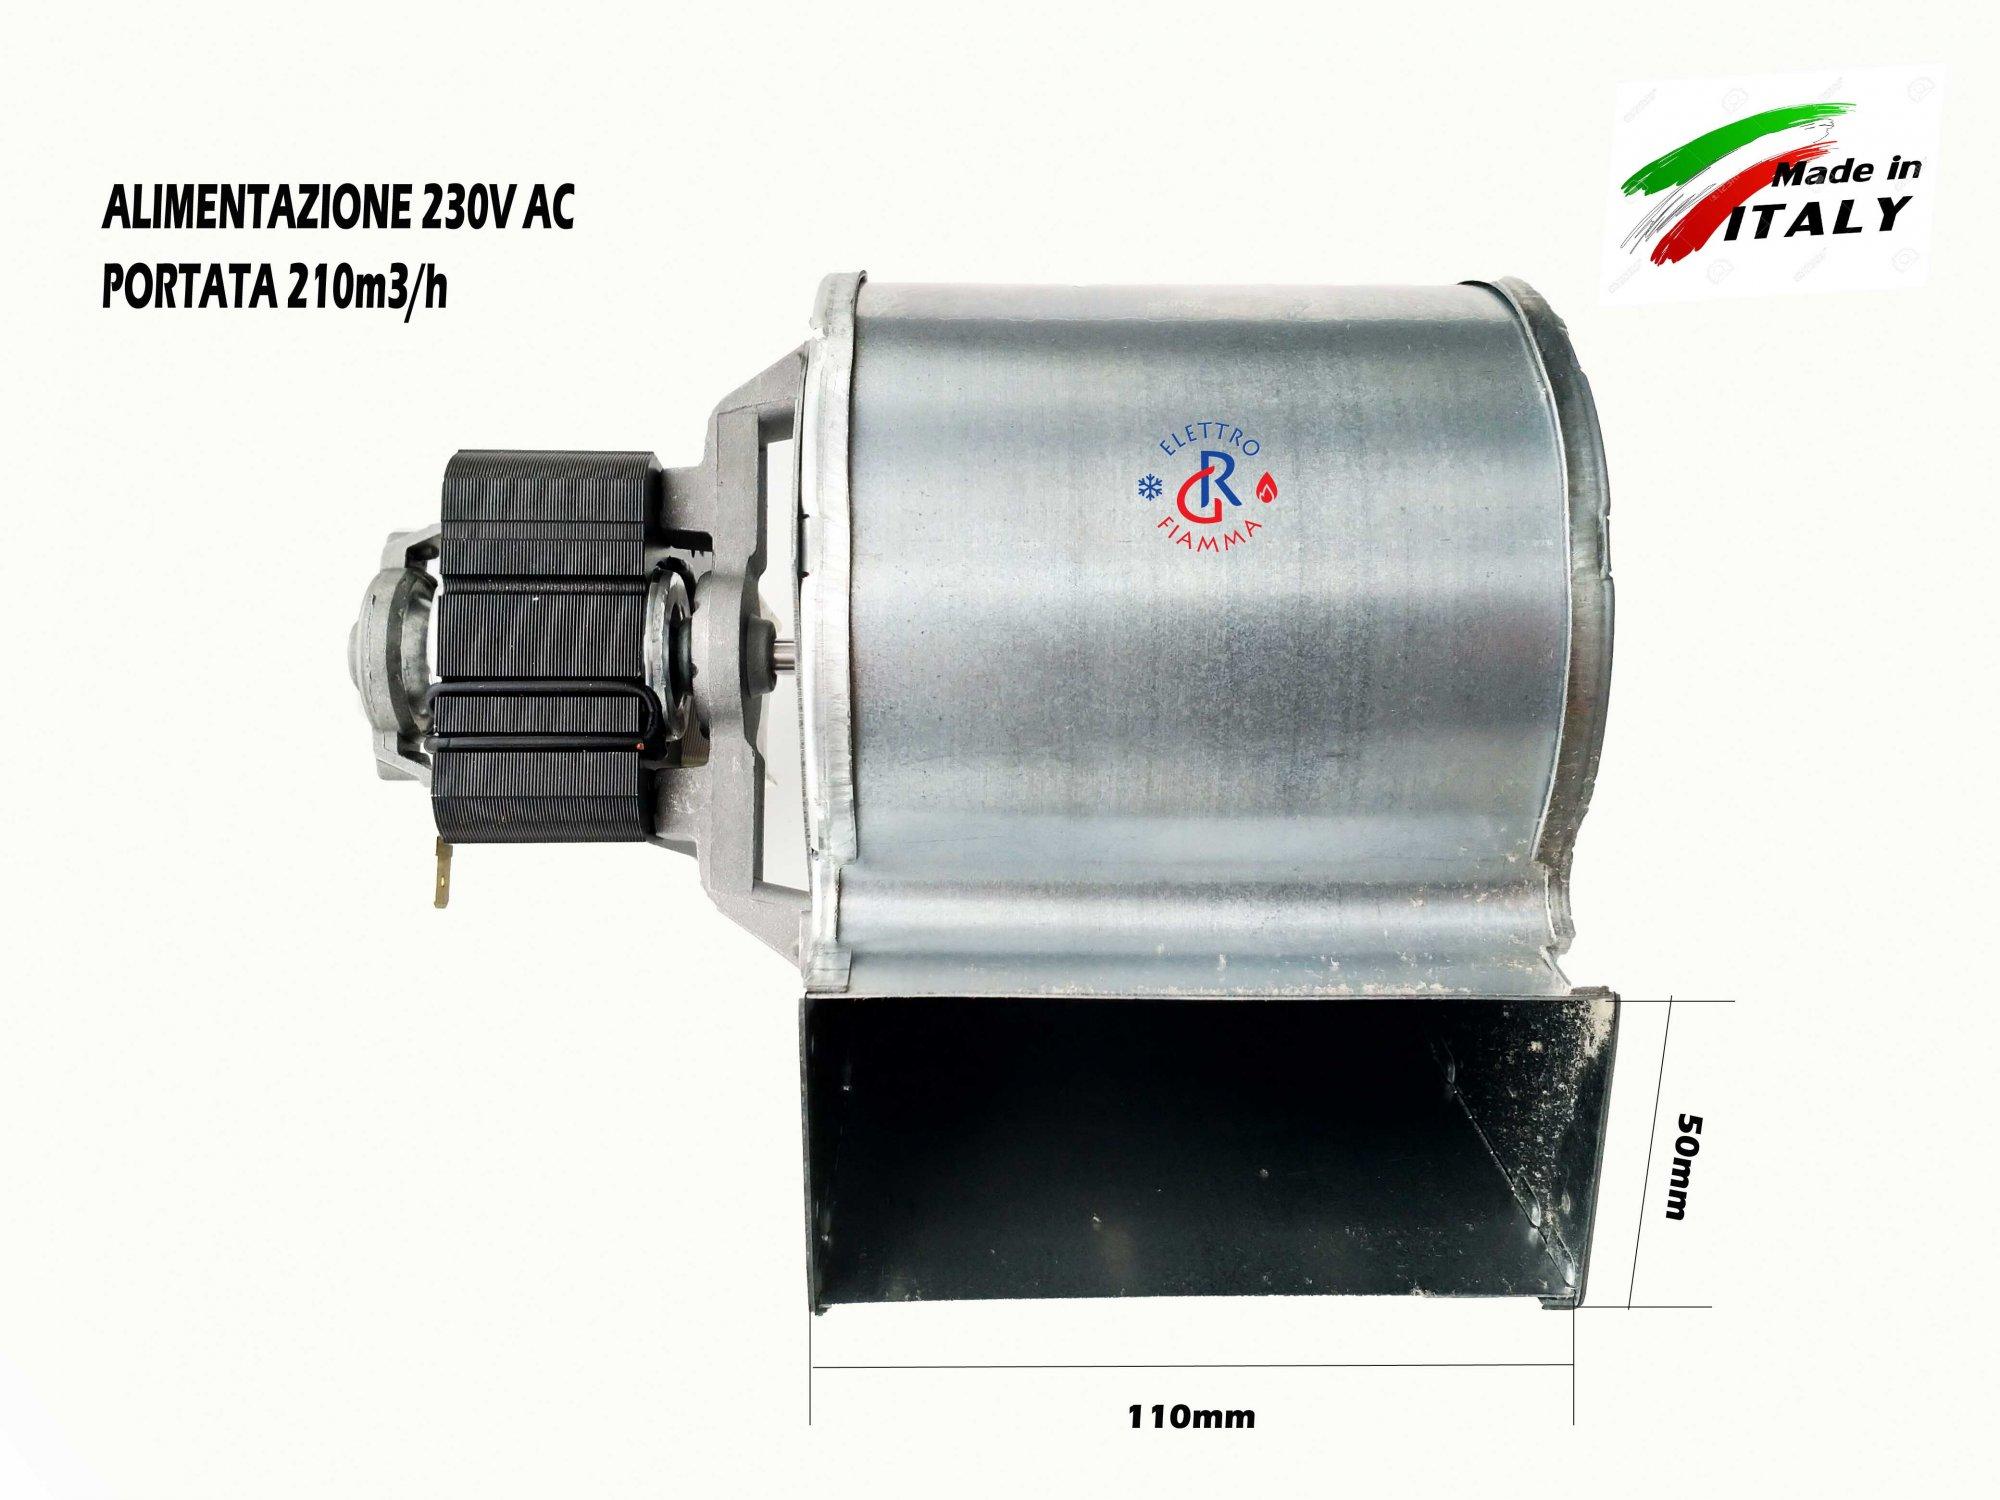 Tubi Aria Calda Stufa Pellet ventola centrifuga per stufe a pellet e camino 50x110 motore sx extraflame  tosca plus emmevi 206501